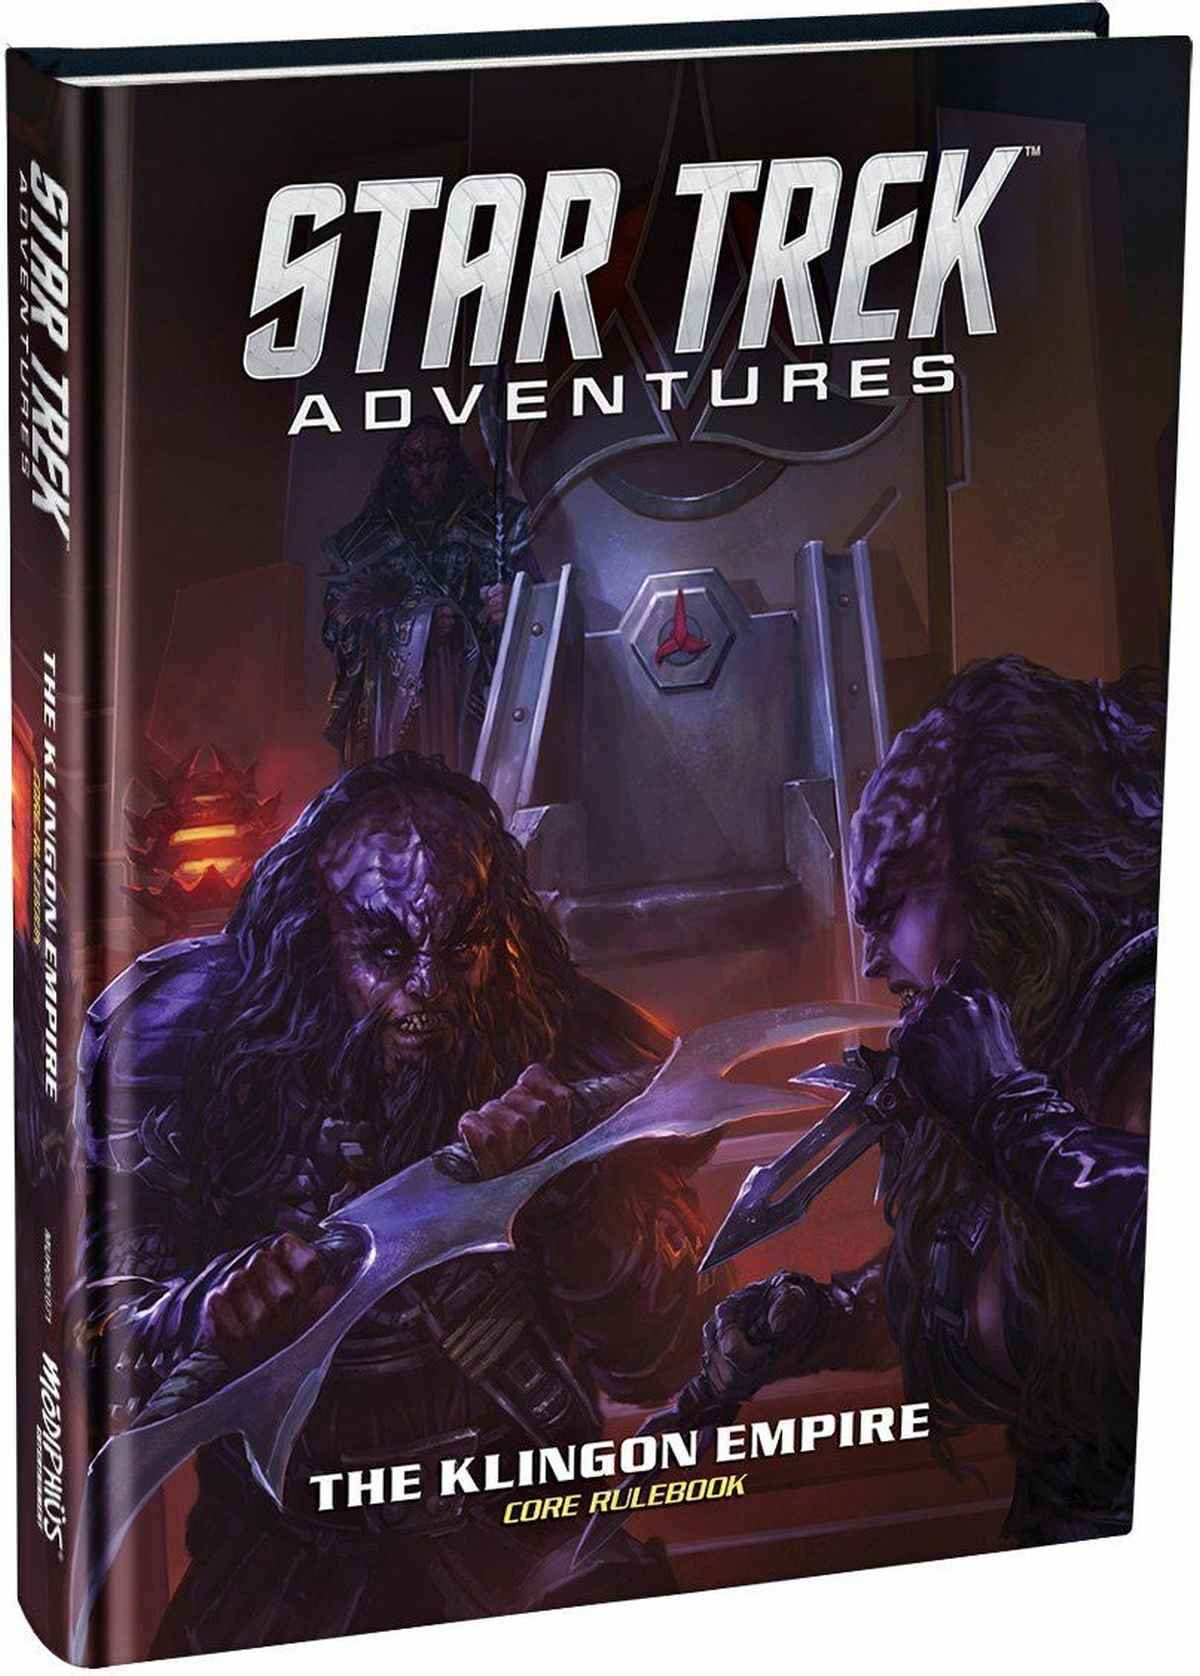 Star Trek Adventures The Klingon Empire 010